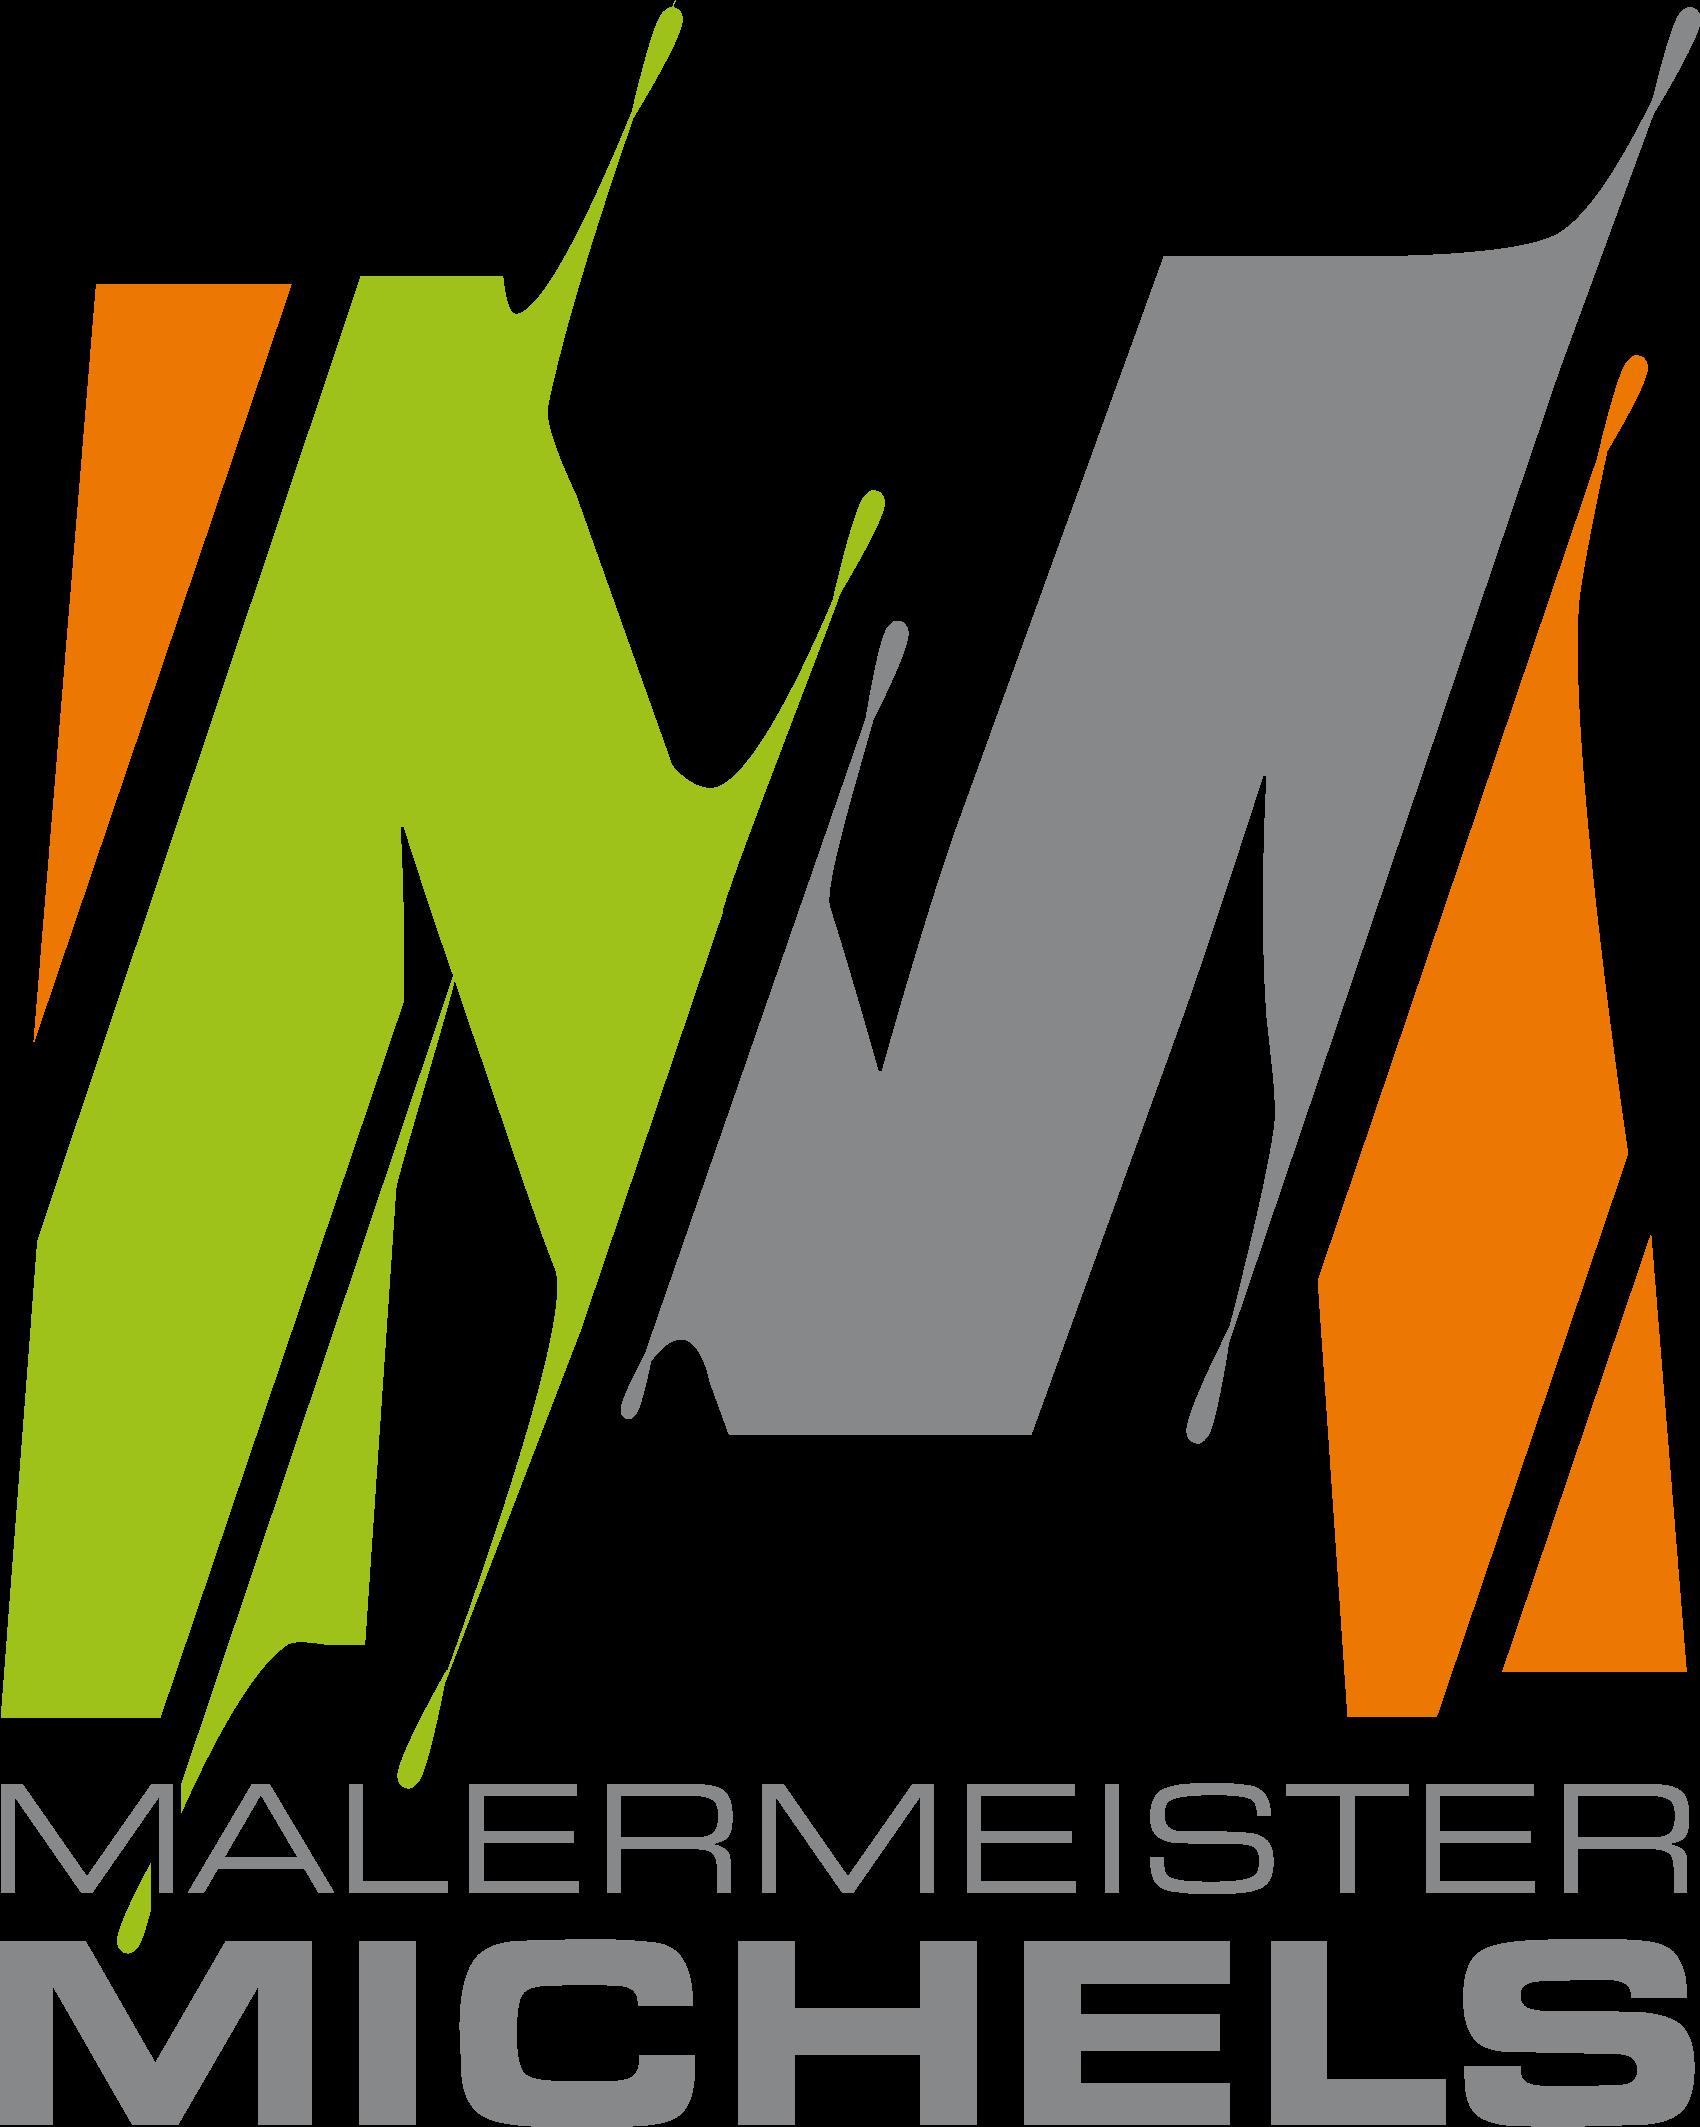 Malermeister Michels